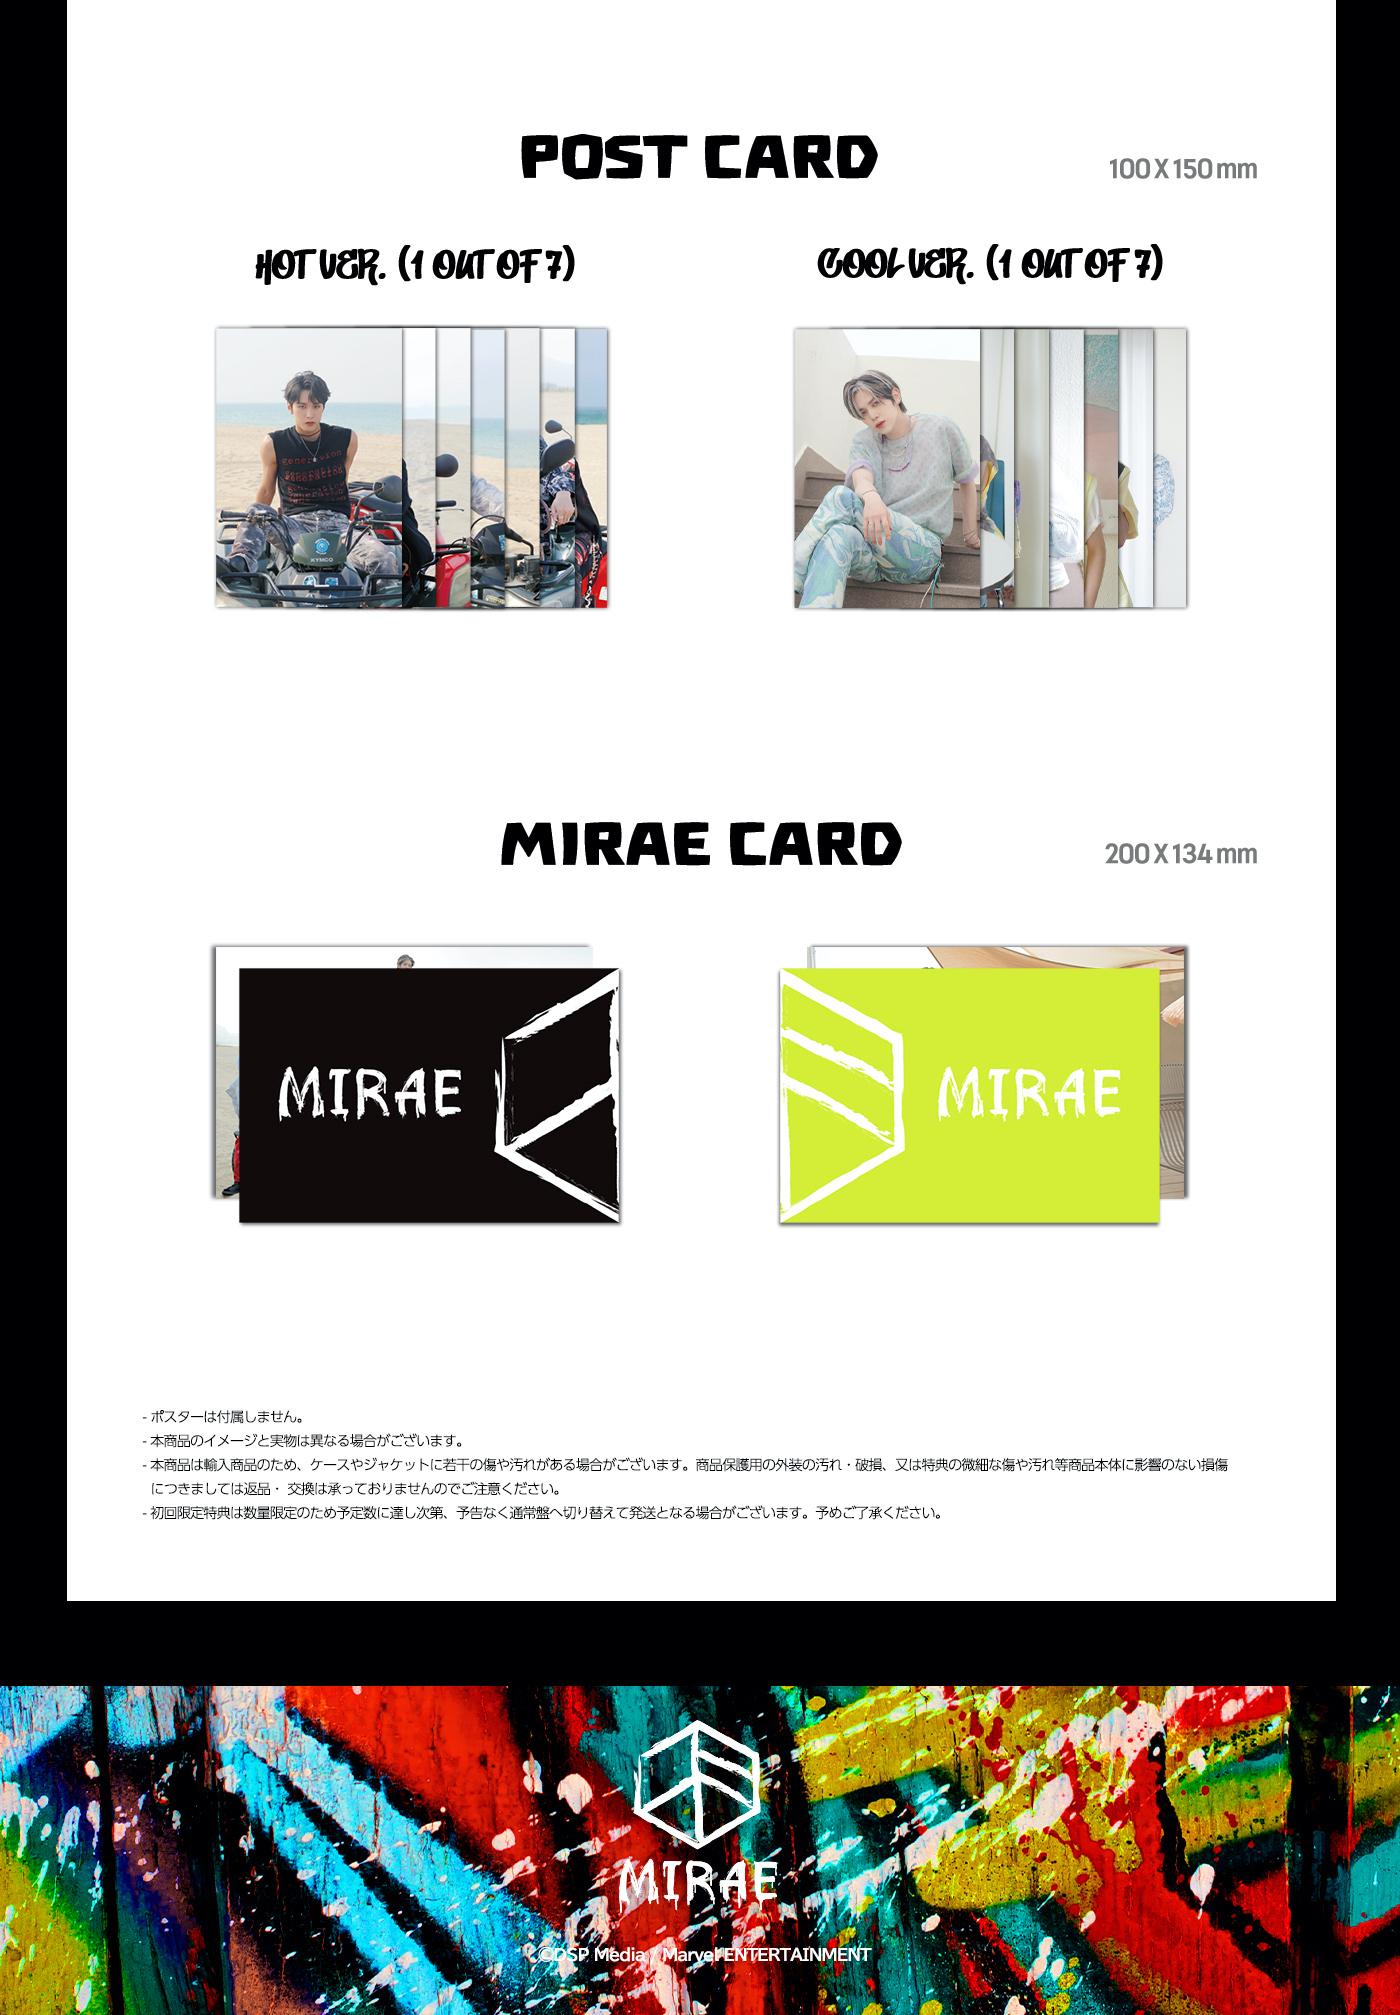 【販売終了/9月4日開催/1部】Splash – MIRAE 2nd Mini Album【オンライン個別握手会対象】